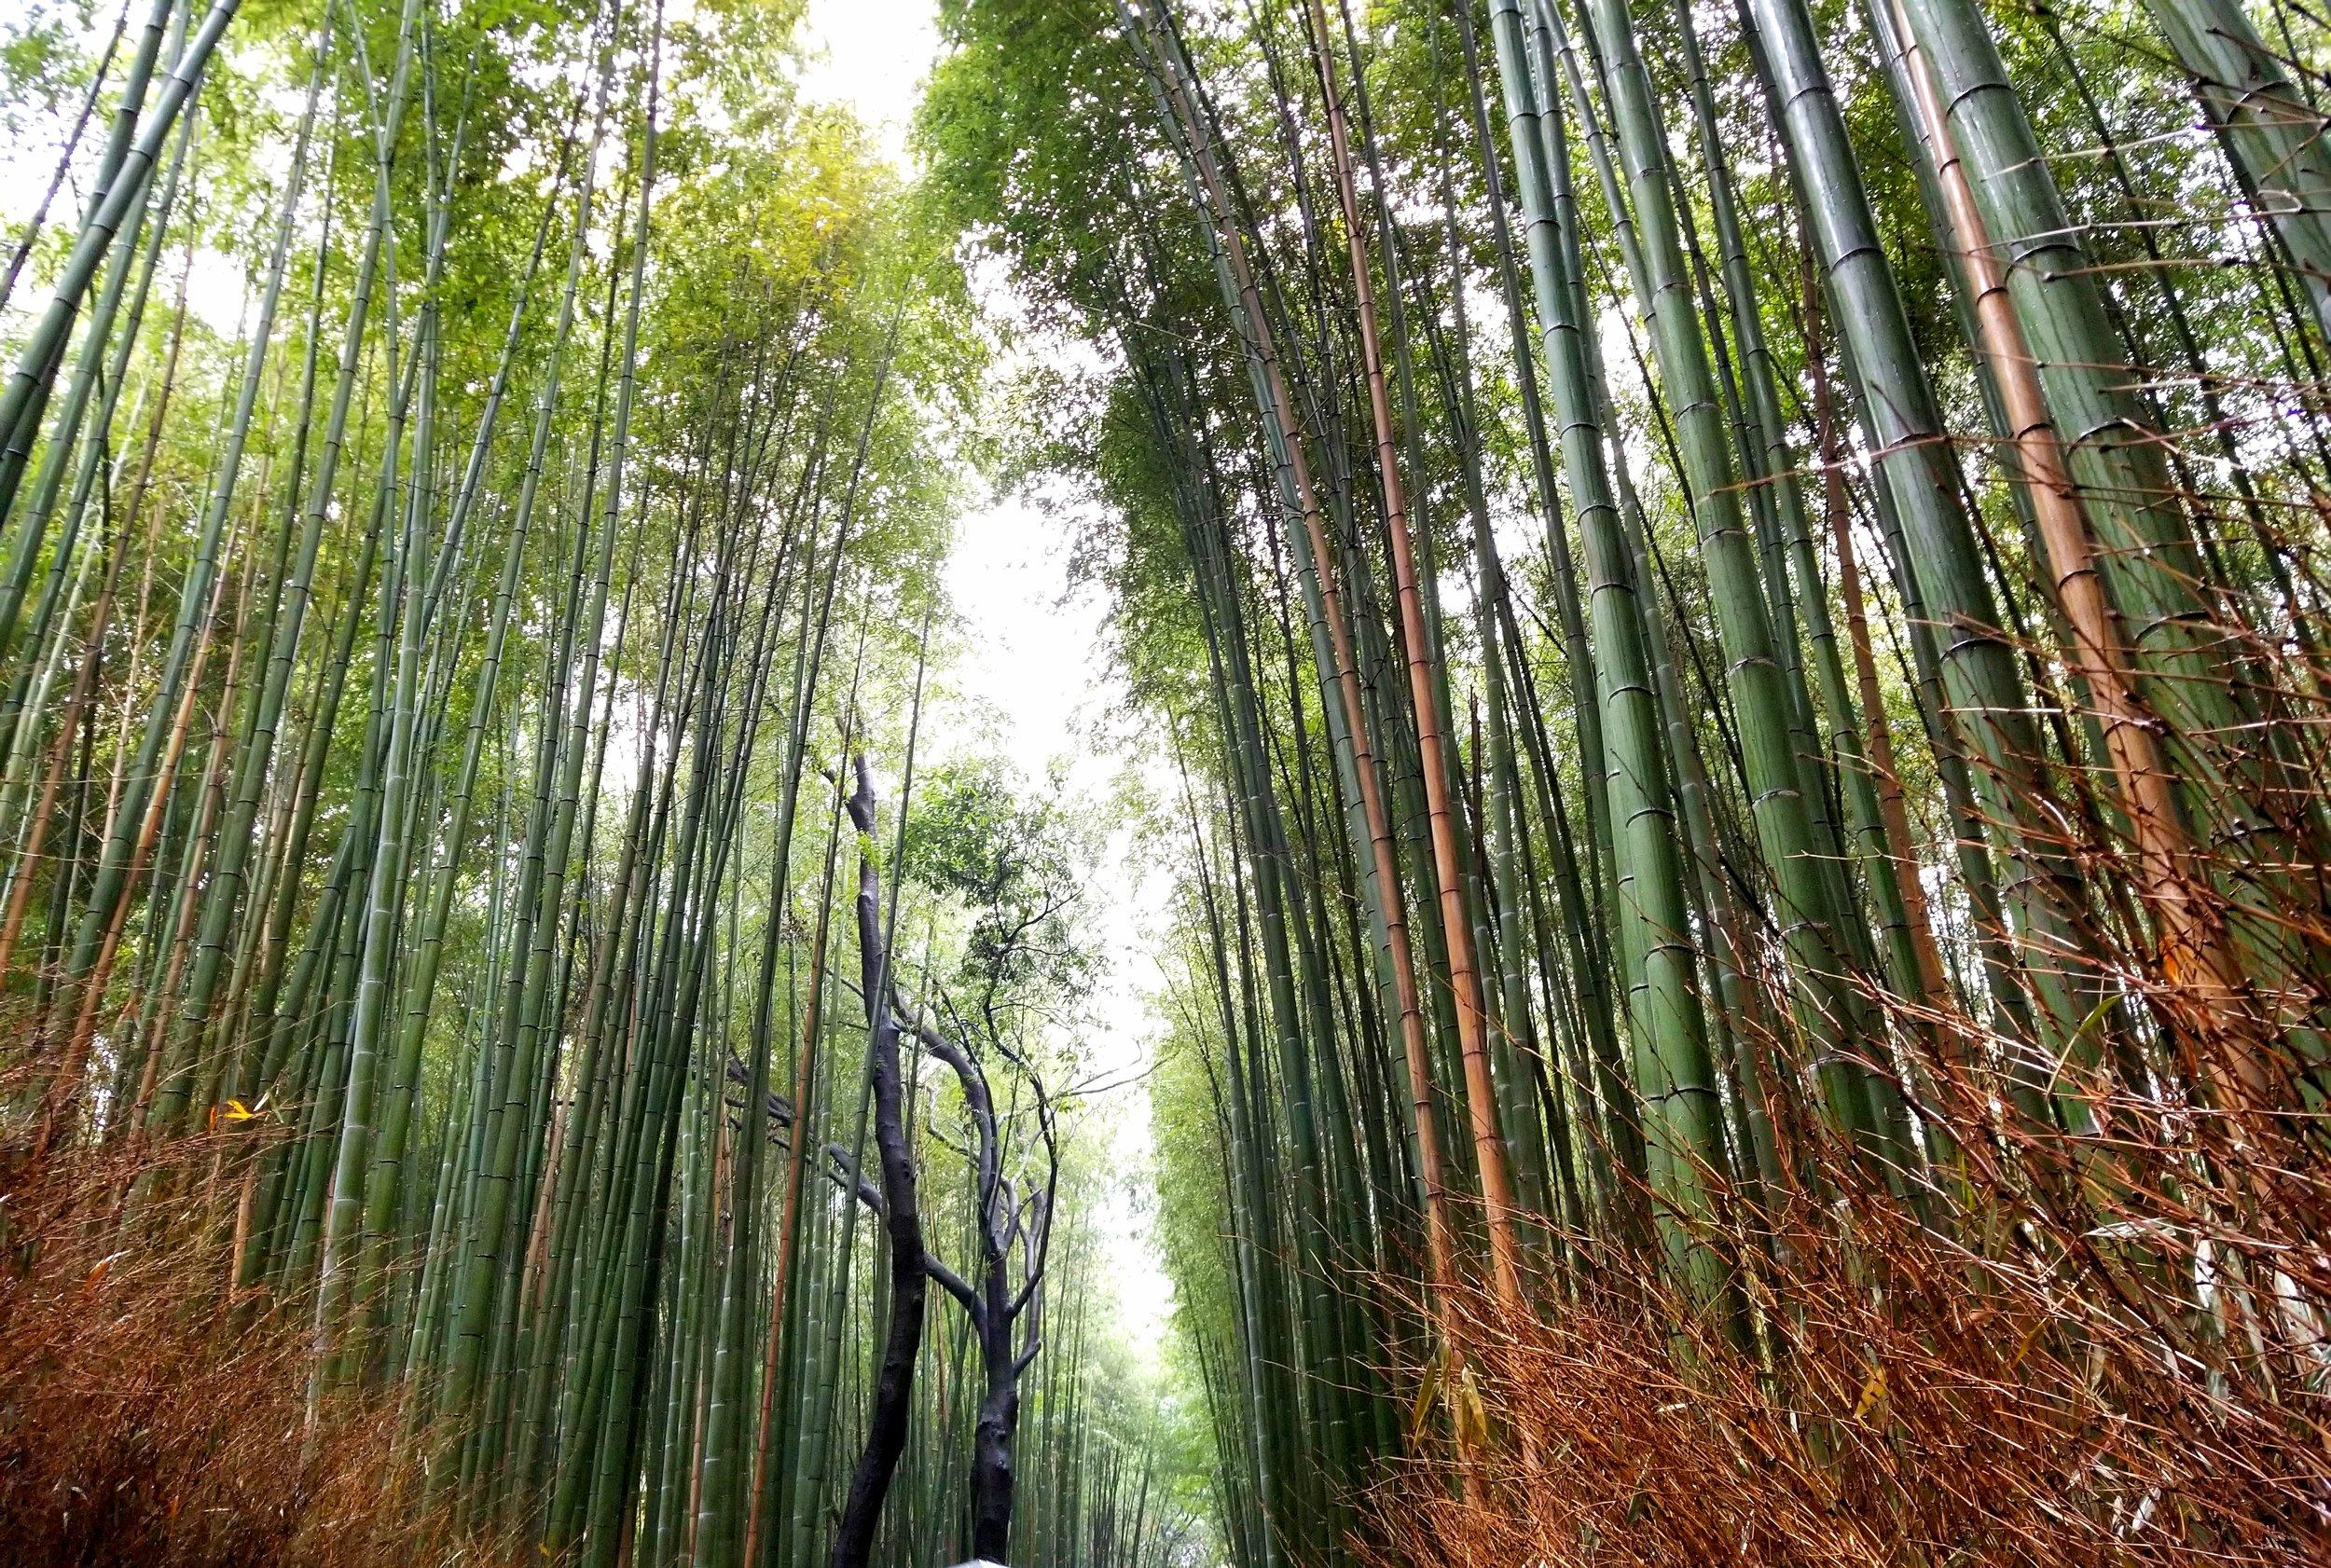 uprooted-traveler-Arashiyama-bamboo-forest-vegan-guide-to-kyoto.jpg